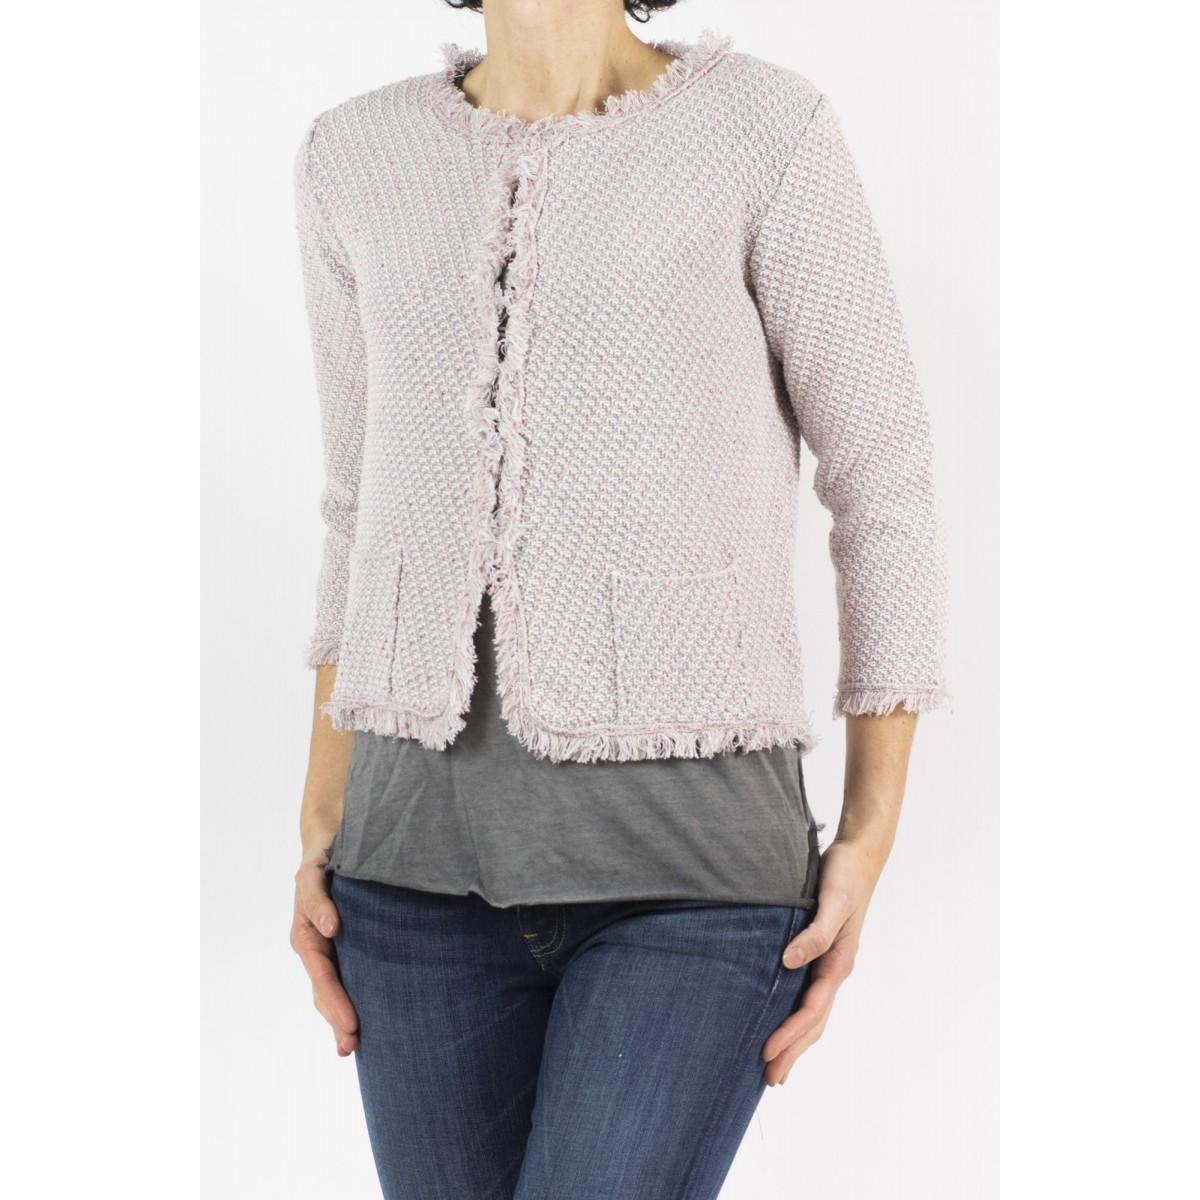 Jacken Kangra Frauen - 8610/58 56 - rosa